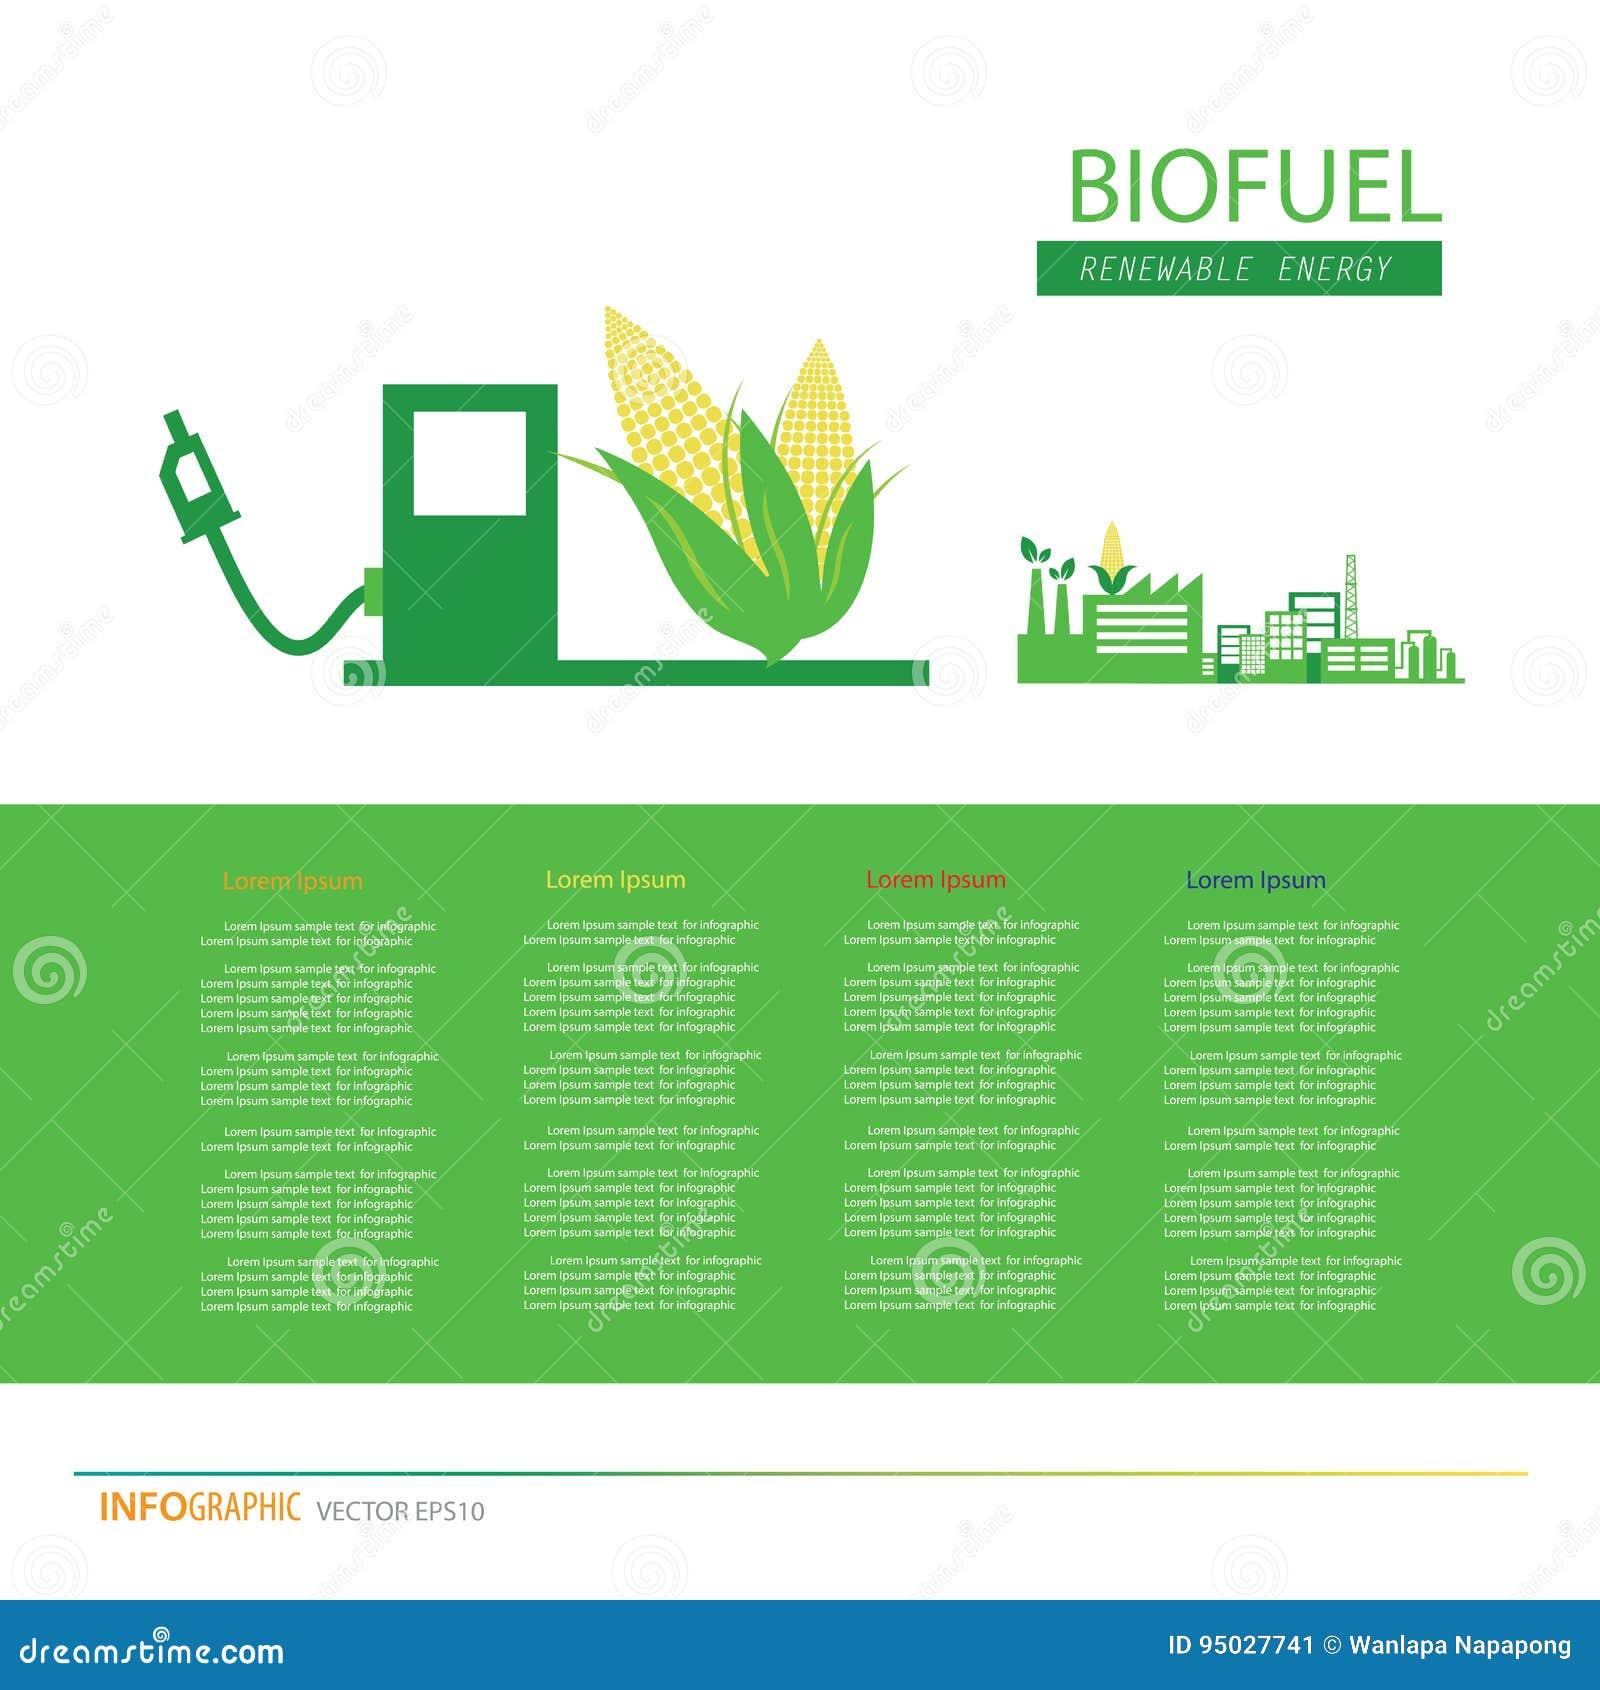 Biofuel stock illustrations 1799 biofuel stock illustrations corn ethanol biofuel vector icon alternative environmental frie vector corn ethanol biofuel vector icon buycottarizona